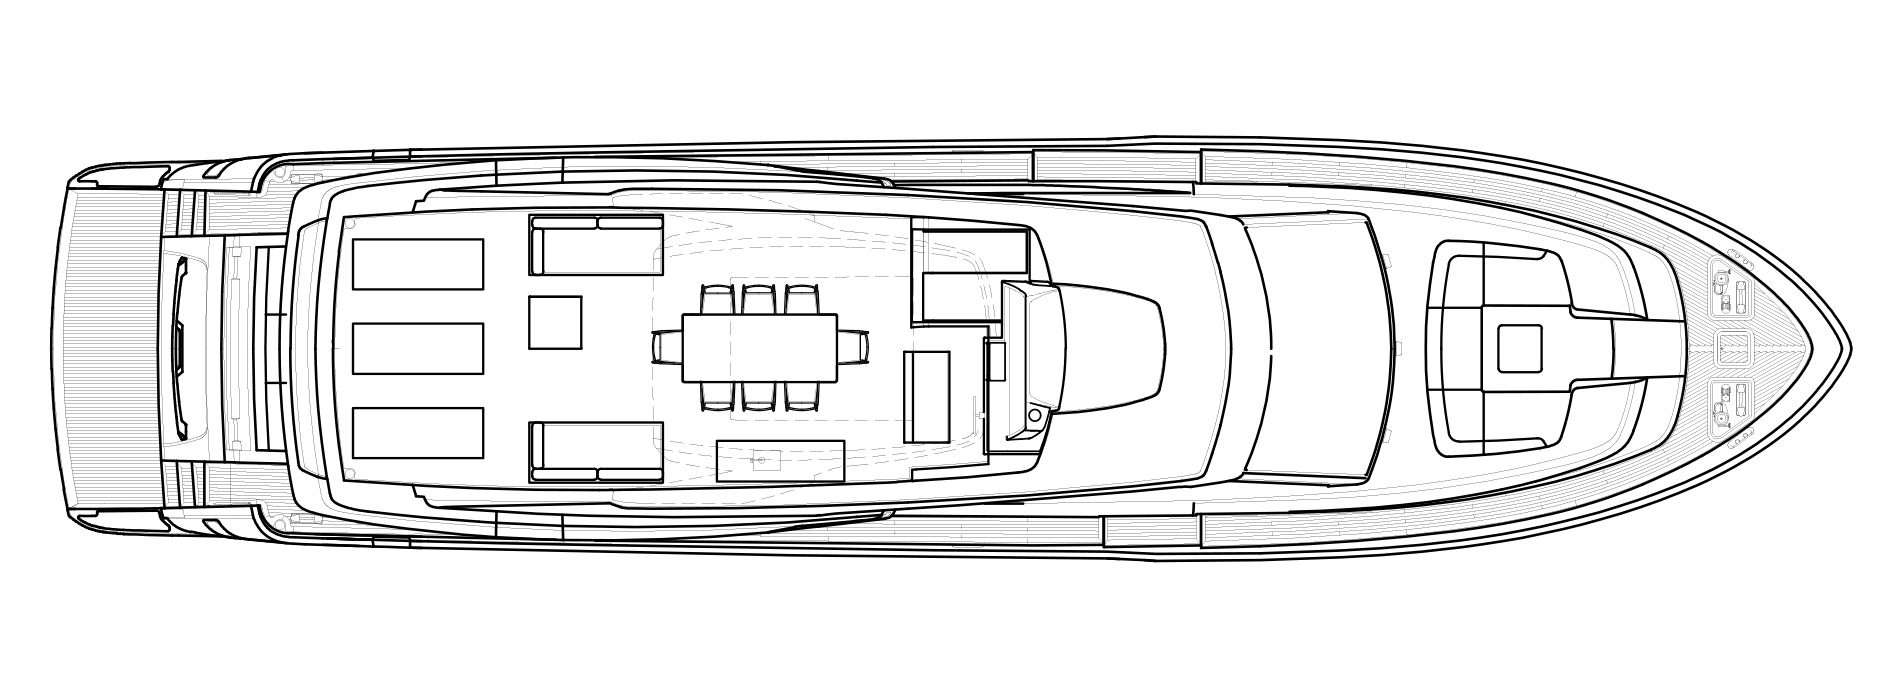 Sanlorenzo Yachts SL86 Flying brigde Versione A